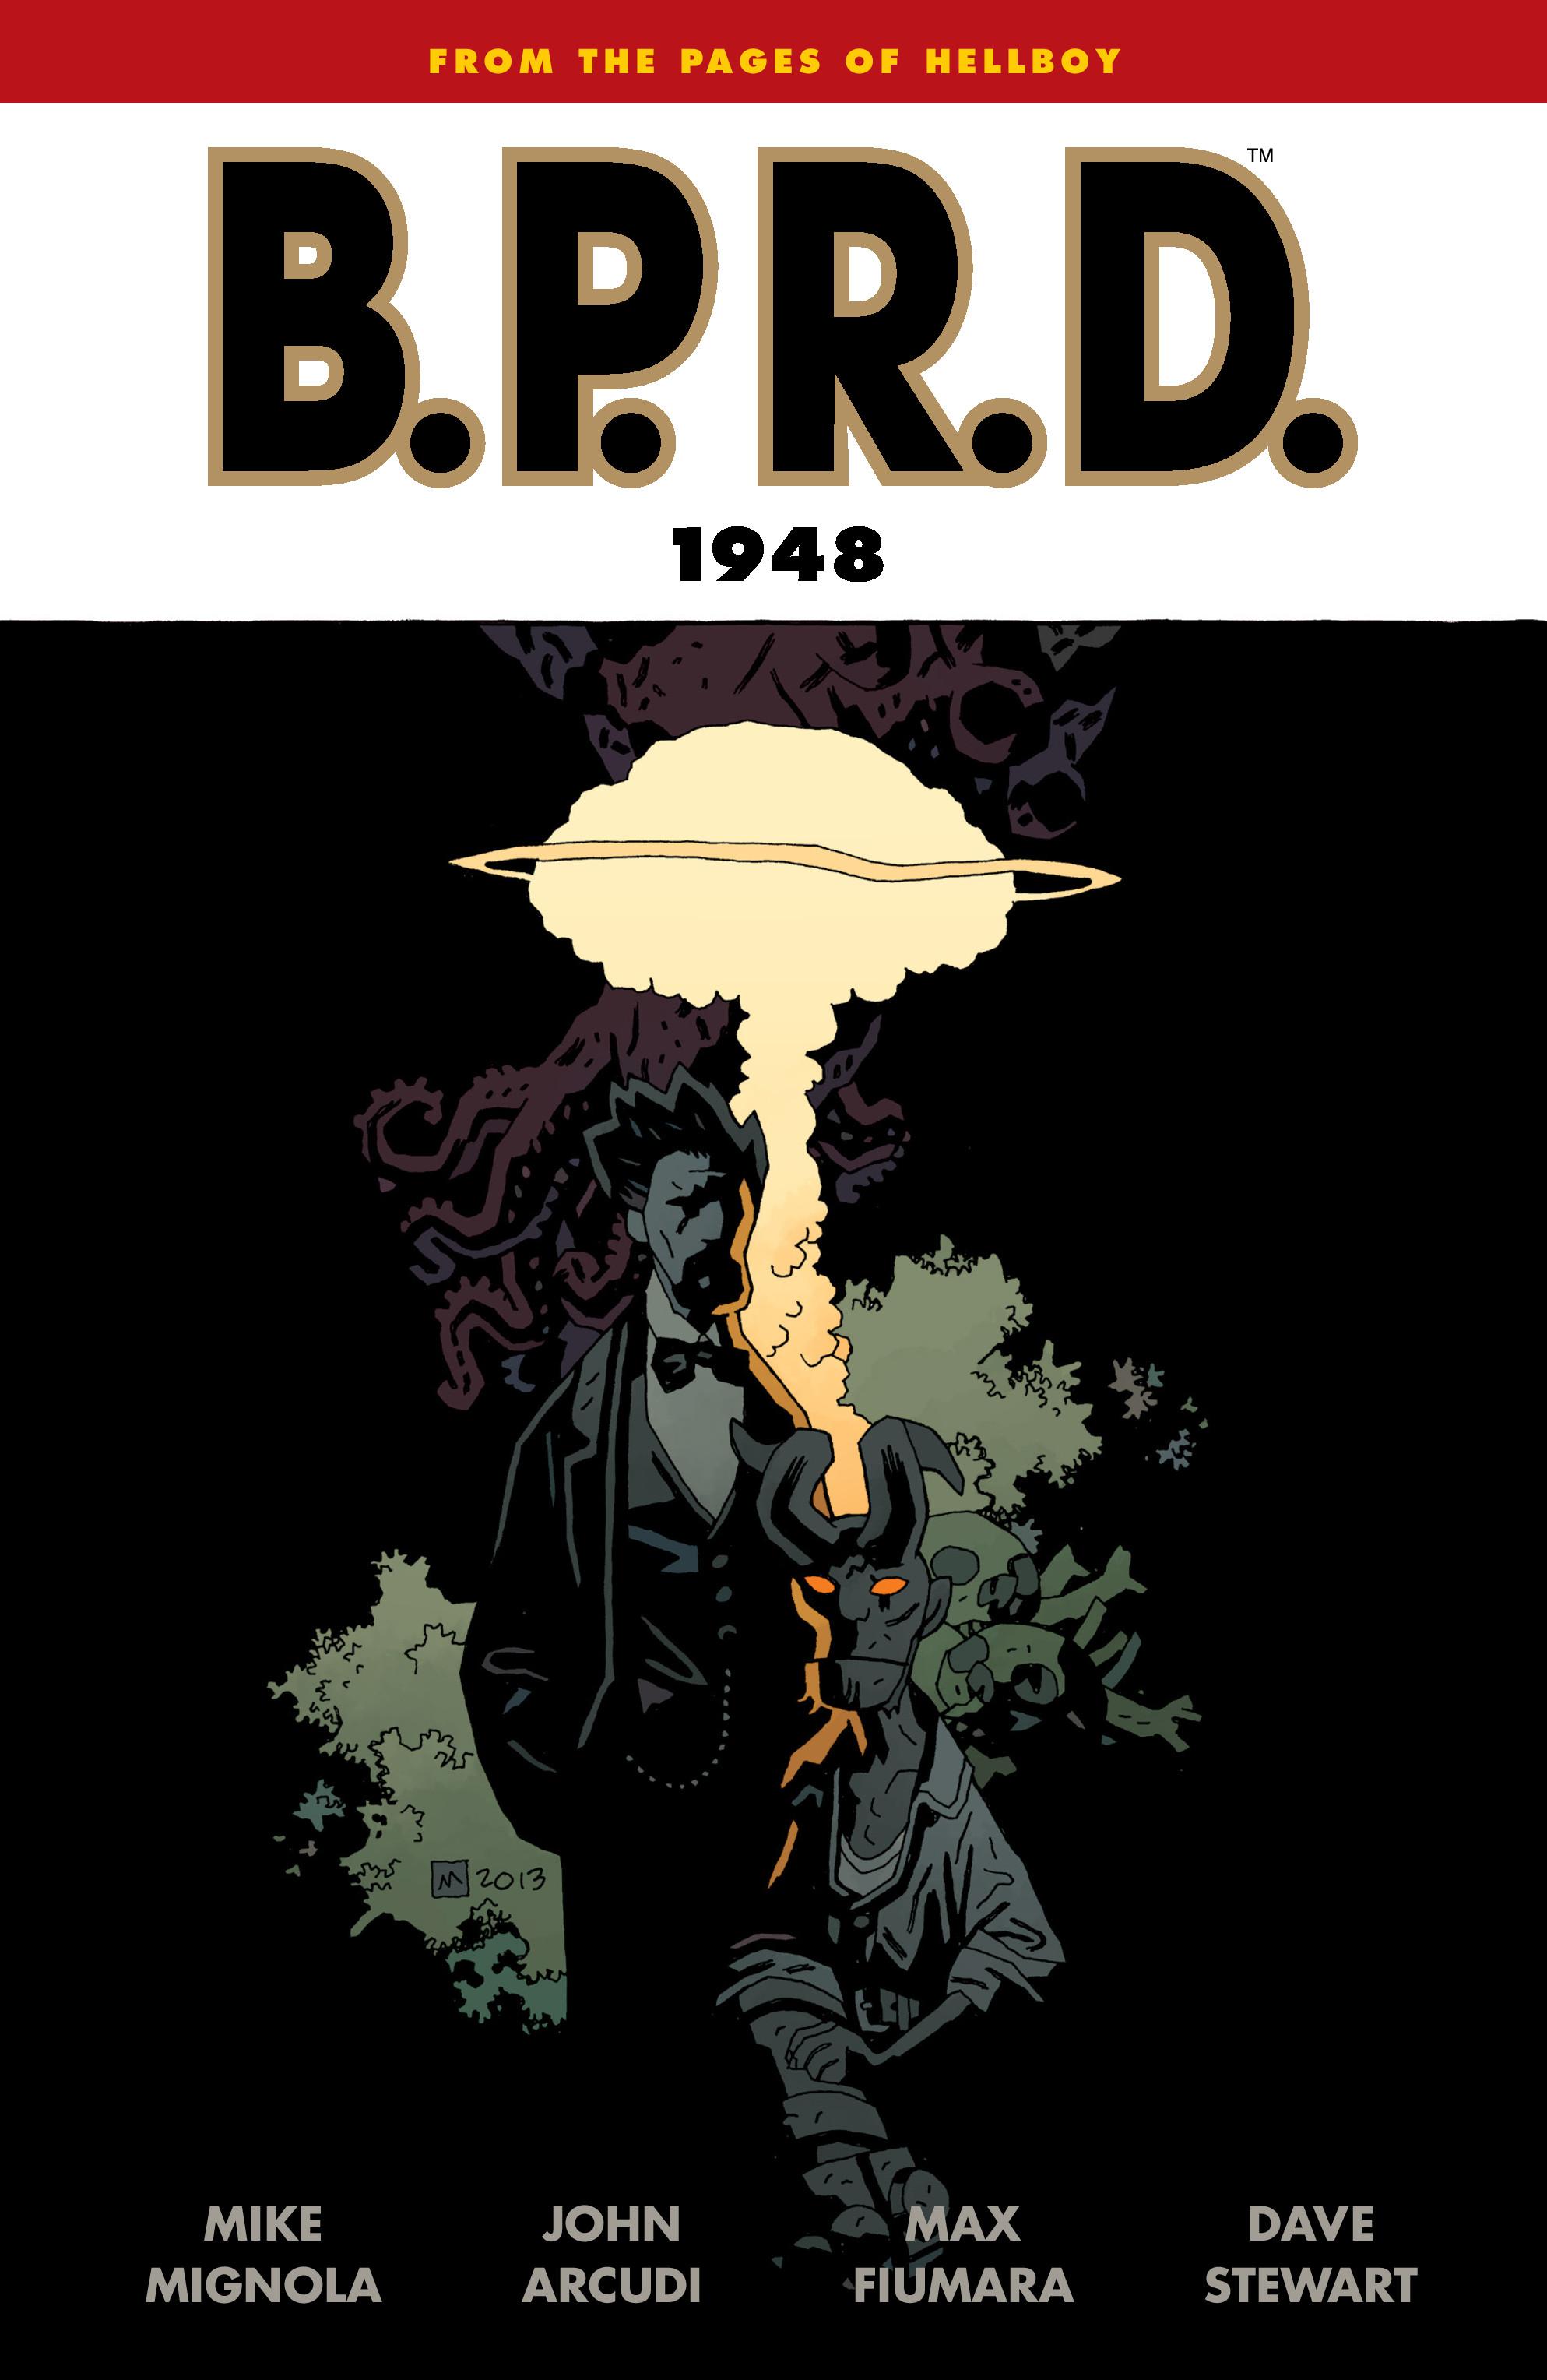 Read online B.P.R.D.: 1948 comic -  Issue # TPB - 1